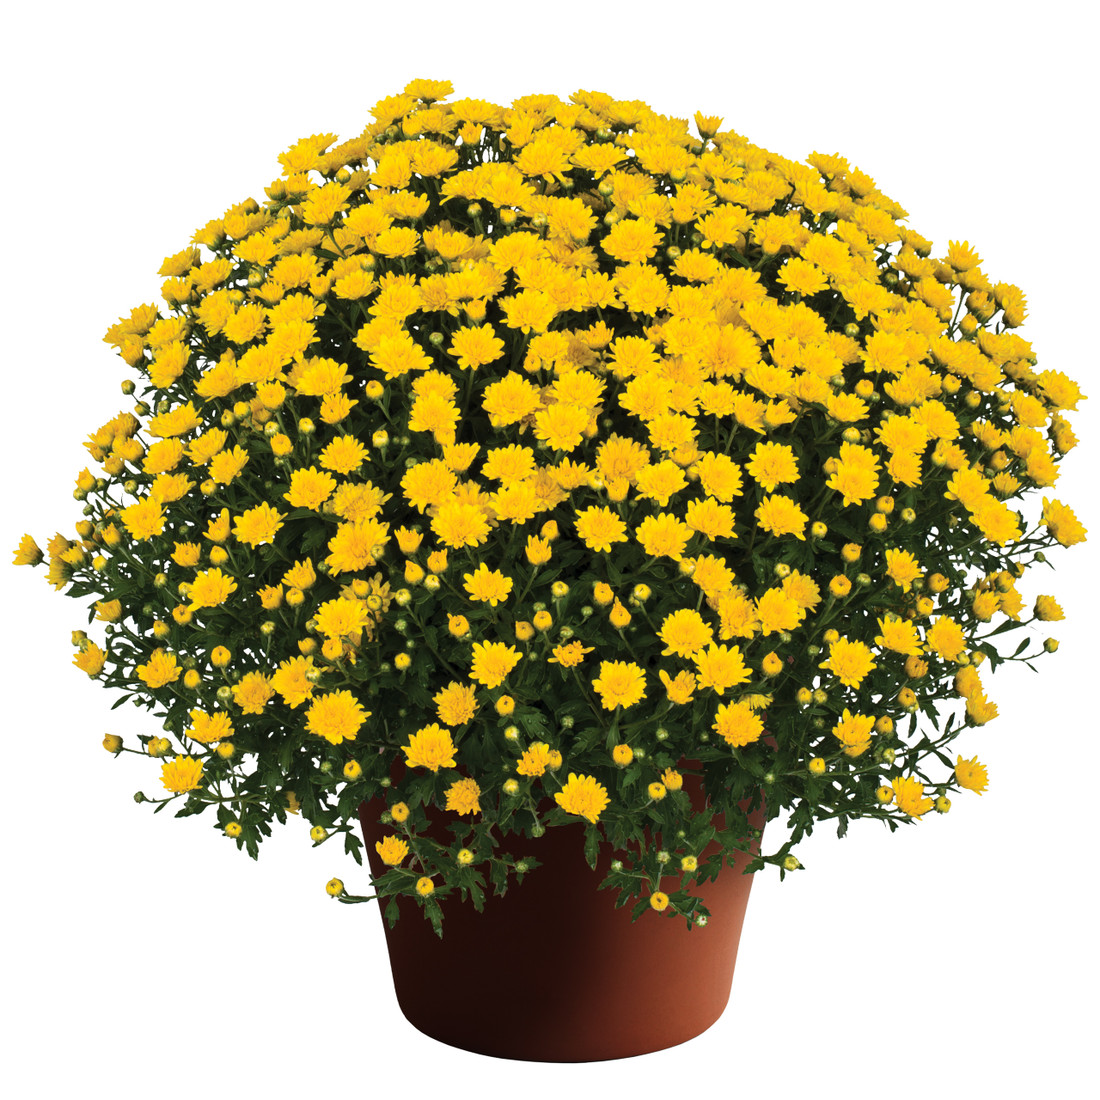 Chrysanthemum 'Elena™ Gold' - 10 Inch Pot